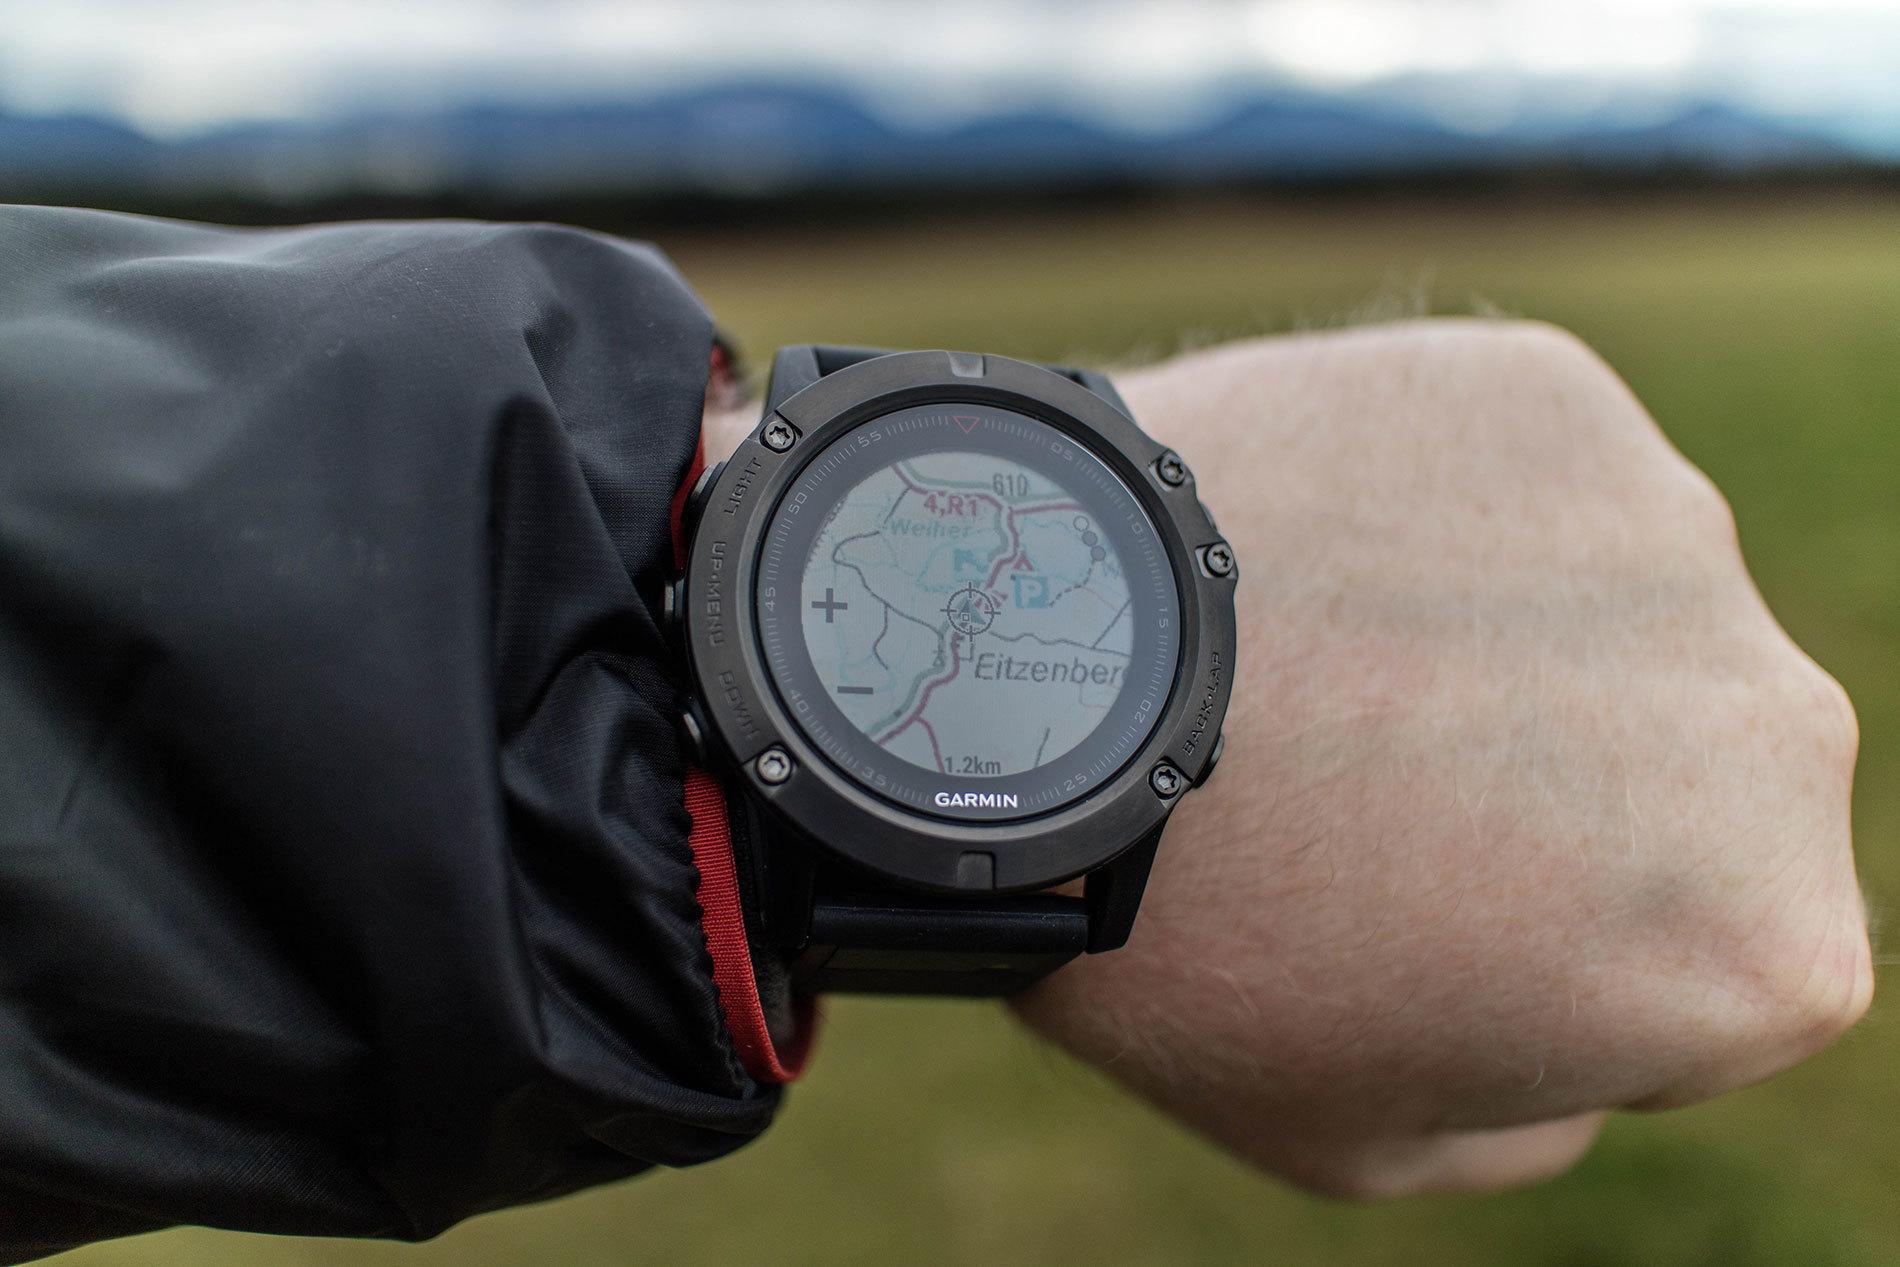 Обзор смарт-часов Garmin Fenix 5X Sapphire - Навигация в часах